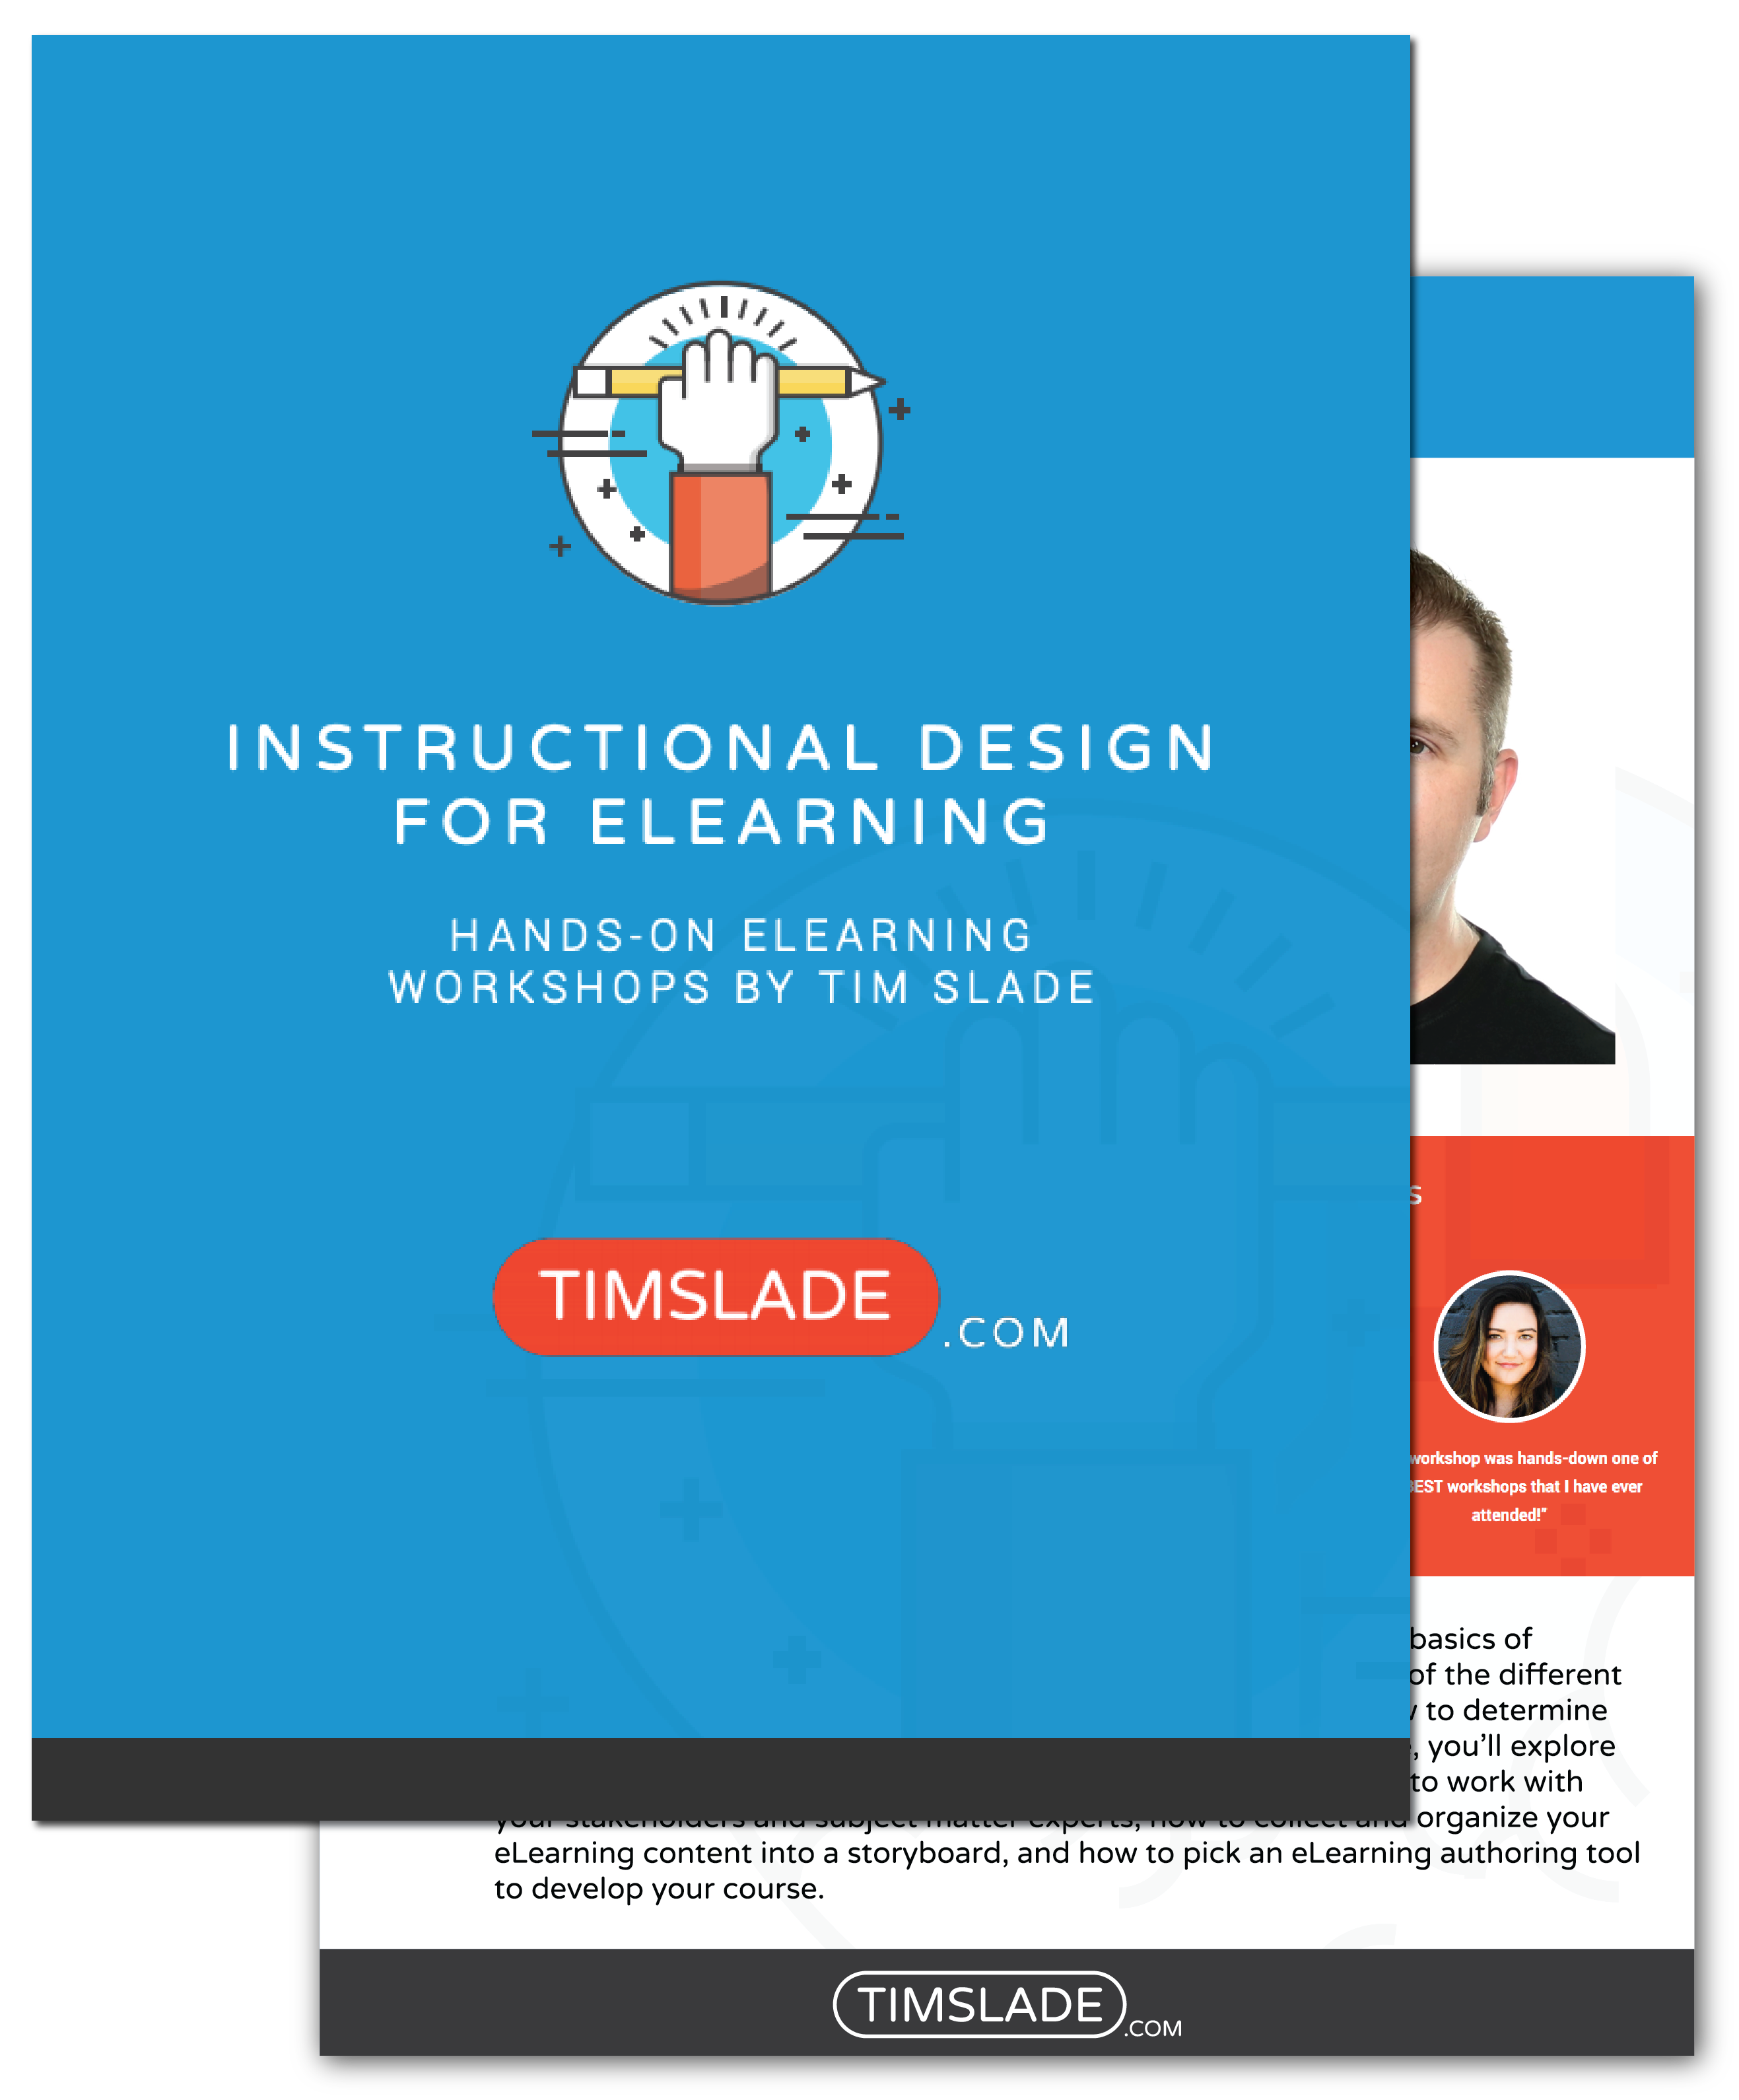 Instructional Design for eLearning - eLearning Workshops by Tim Slade